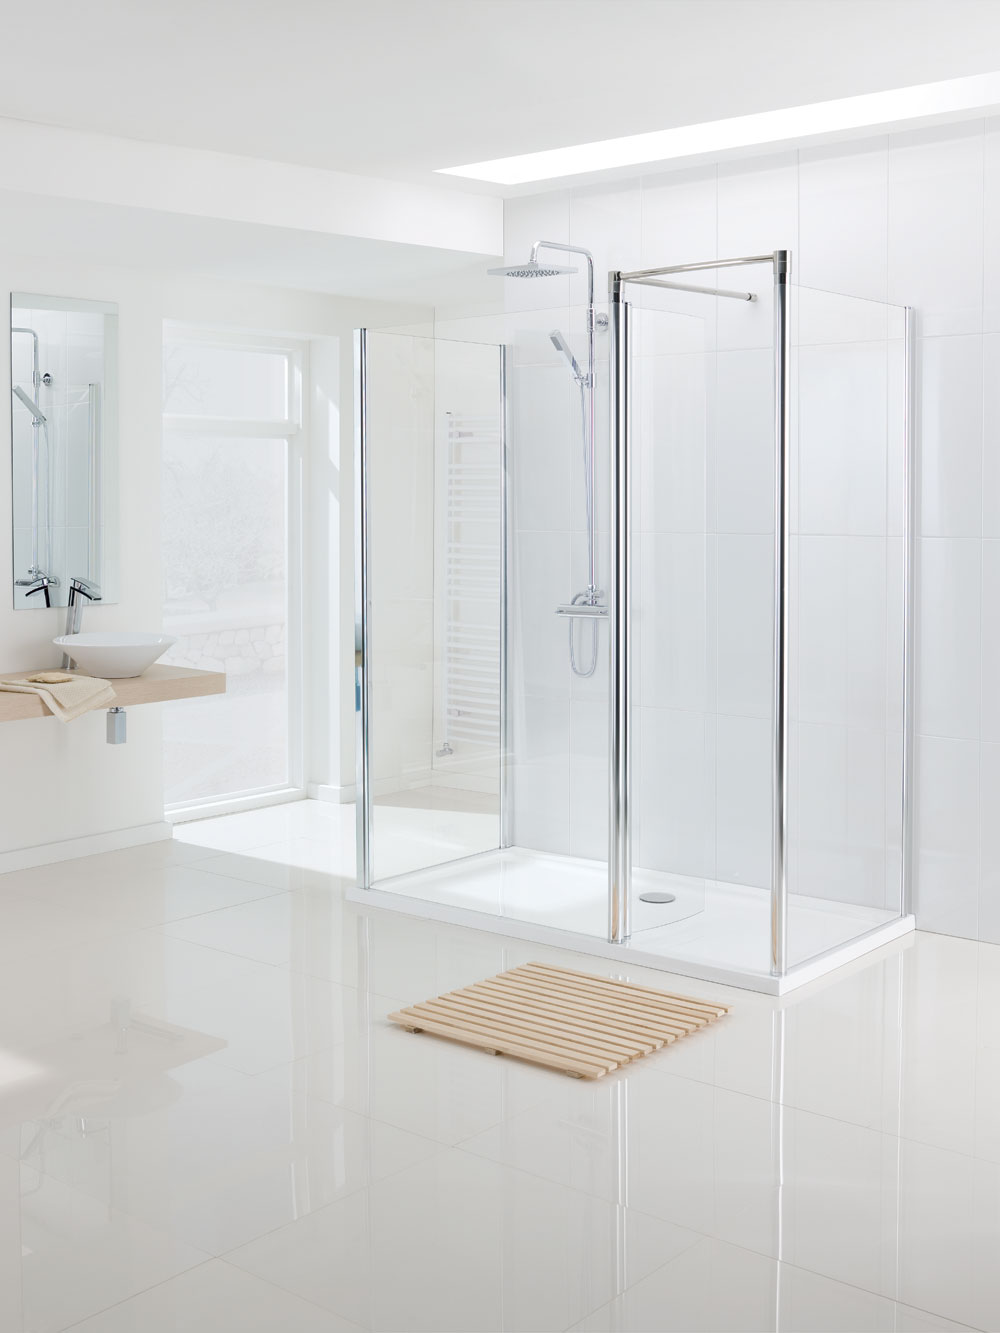 Top tips to create that minimalist bathroom look - Lakes Bathrooms